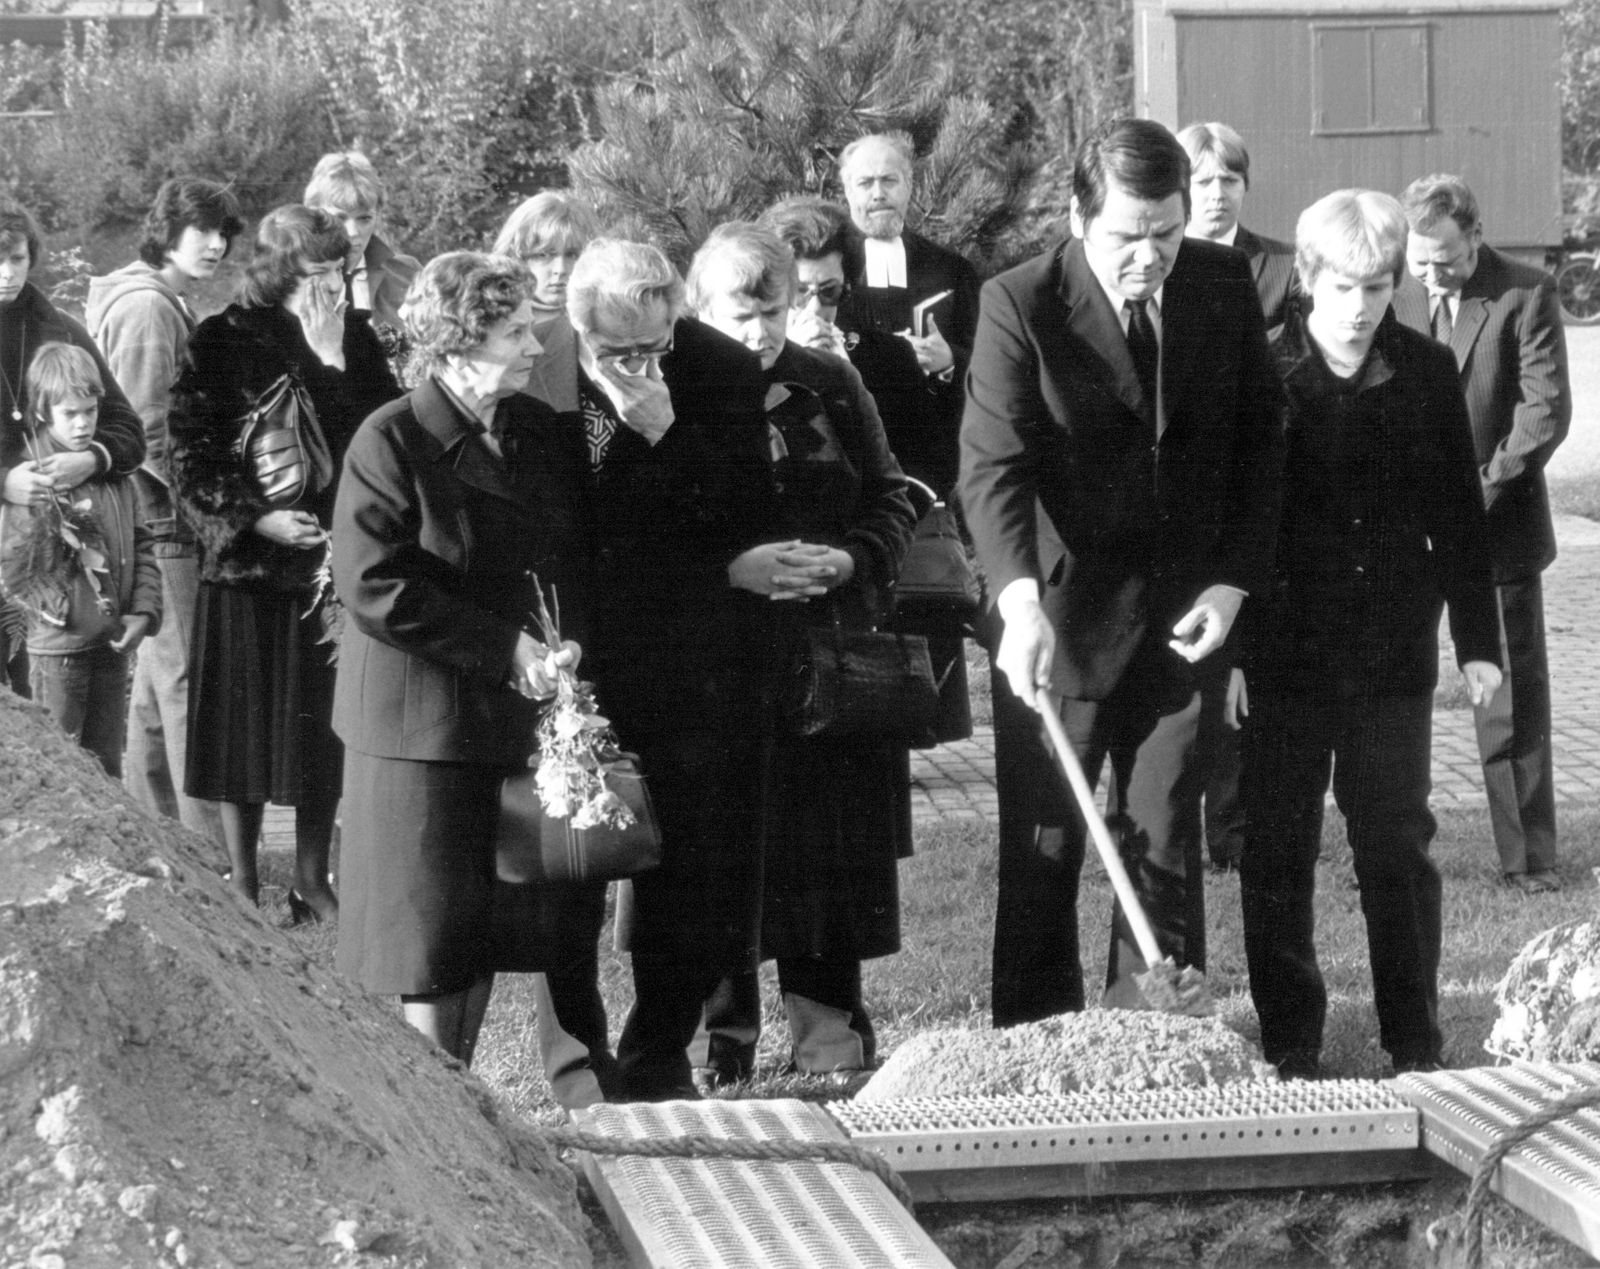 Beerdigung Klaus-Jürgen Rattay